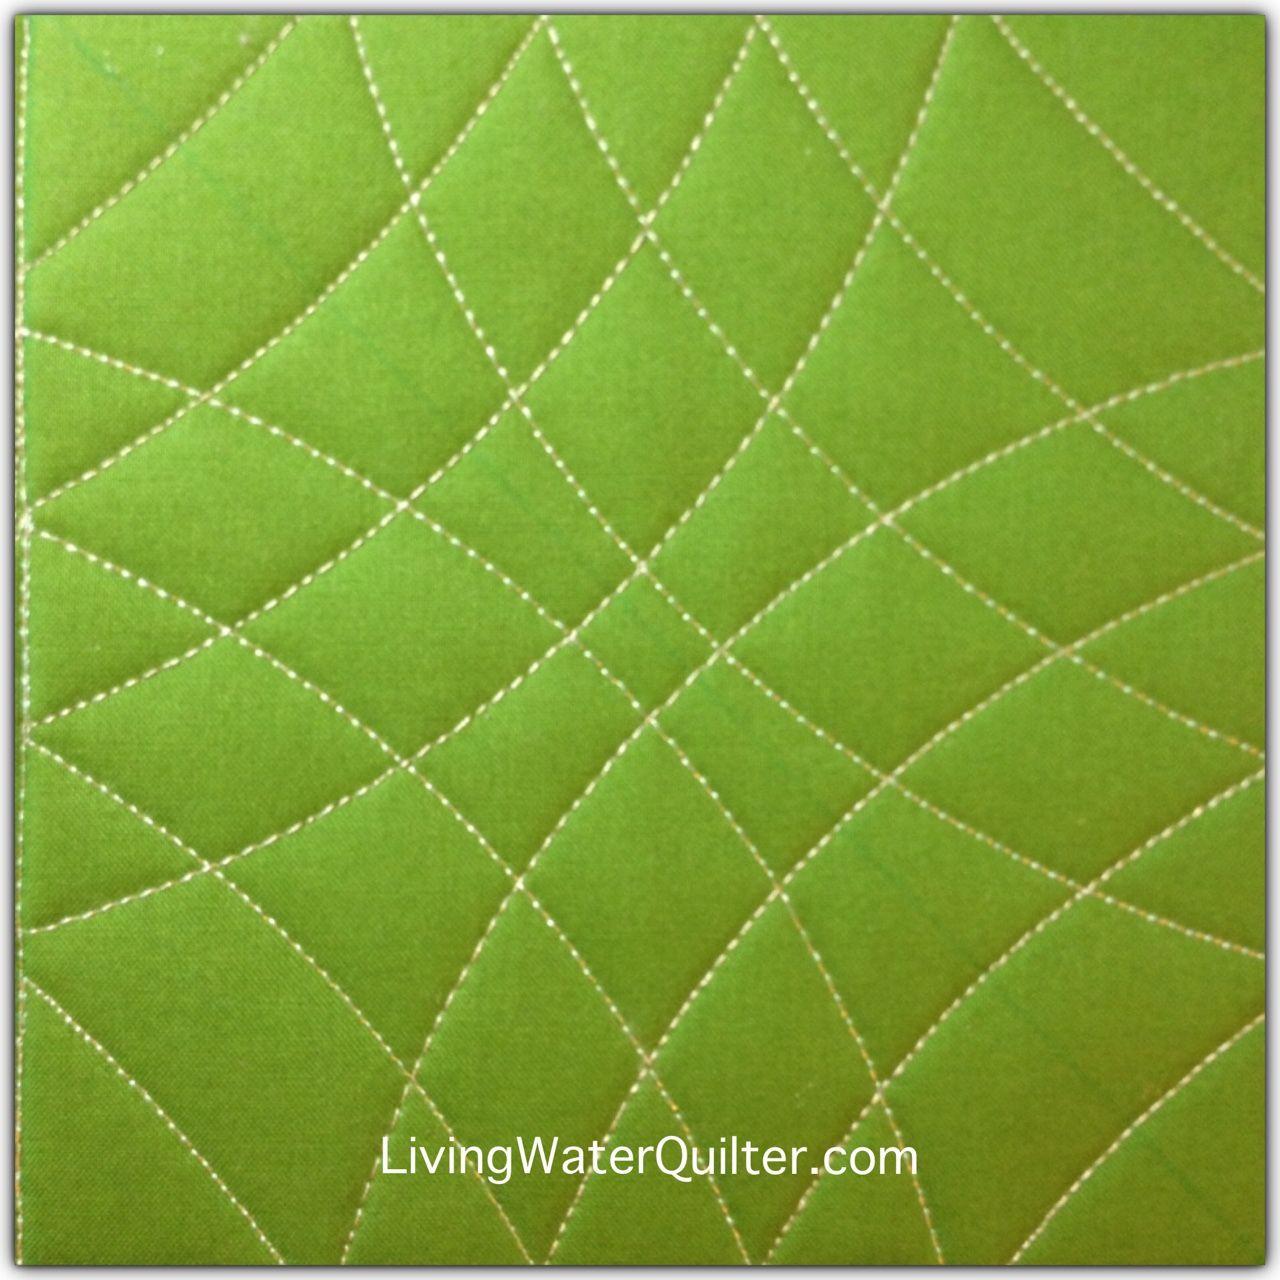 Geraldine Wilkins LivingWaterQuilter.com Ruler quilting Westalee ...